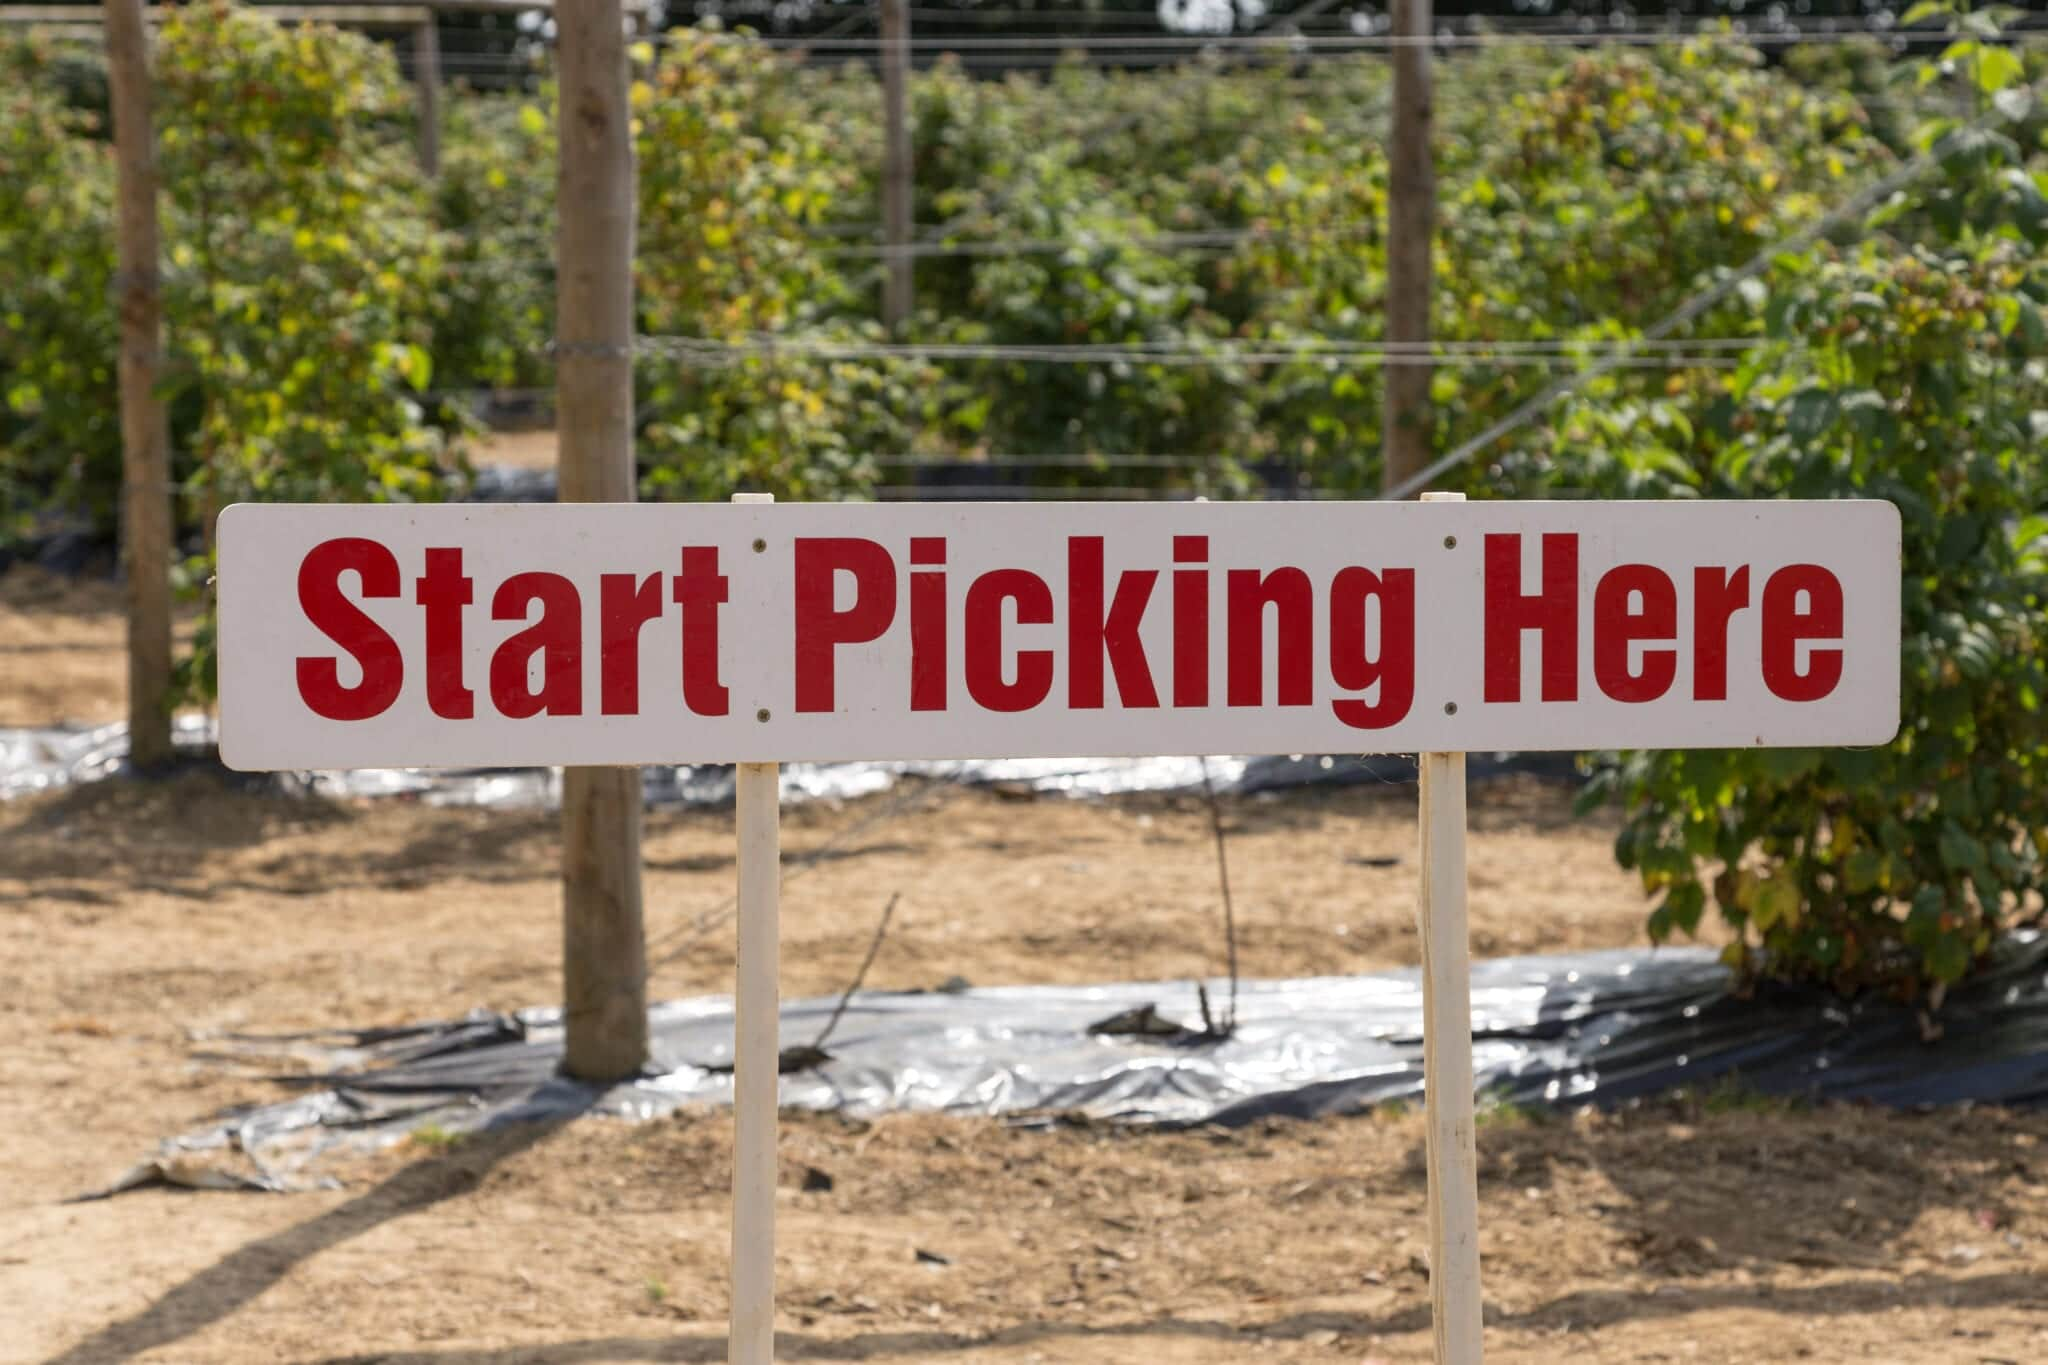 U Pick Berry Farms